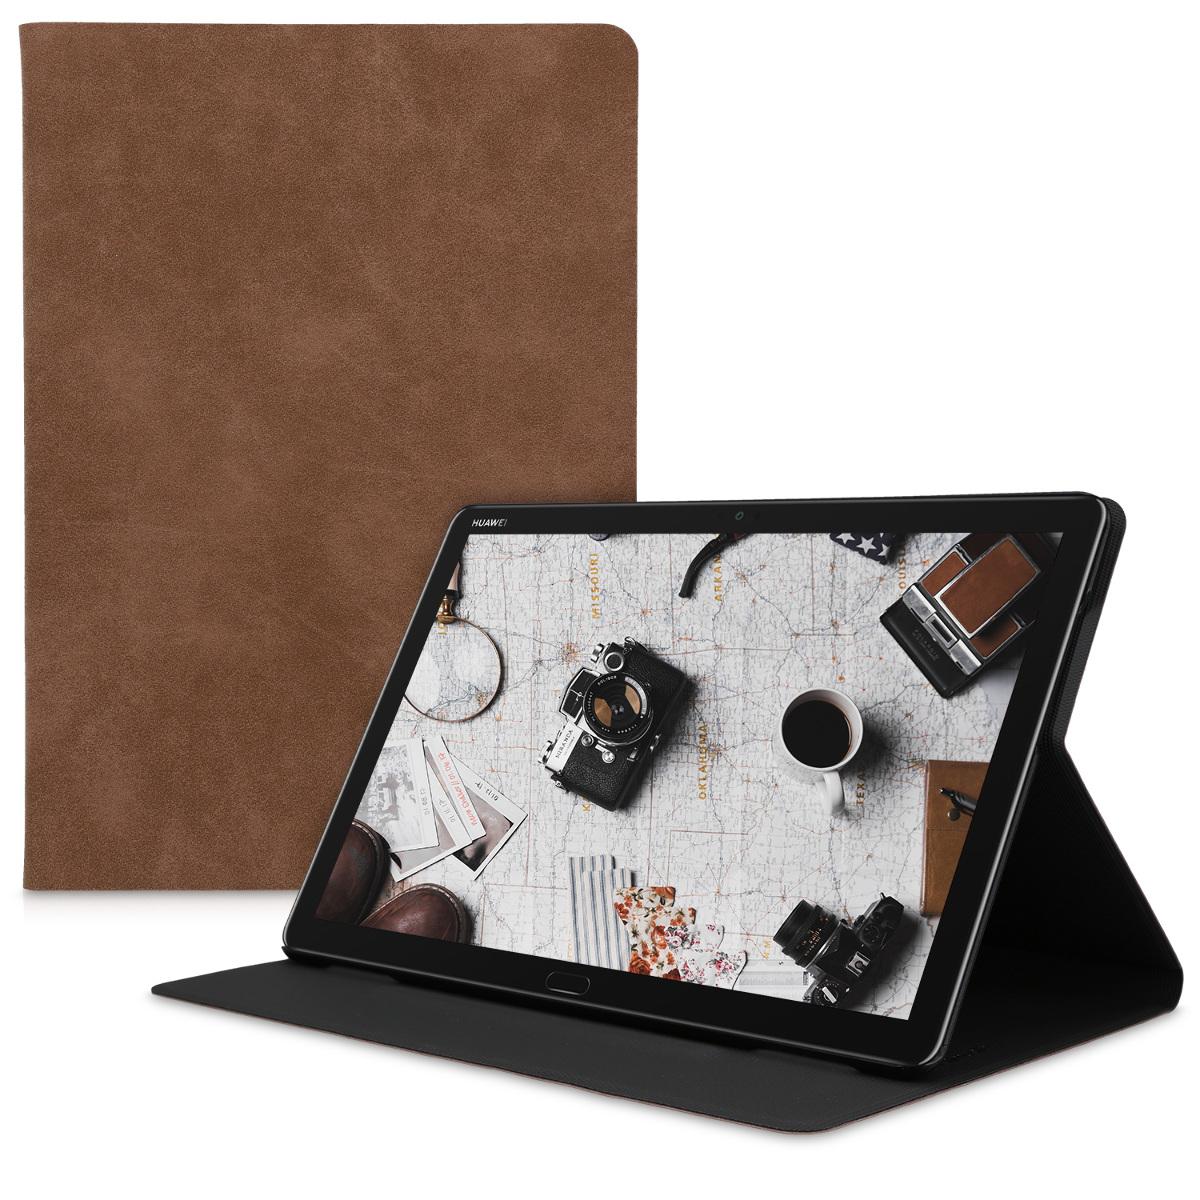 KW Suede Θήκη Πορτοφόλι Huawei MediaPad M5 Lite 10 - Brown (49722.05)